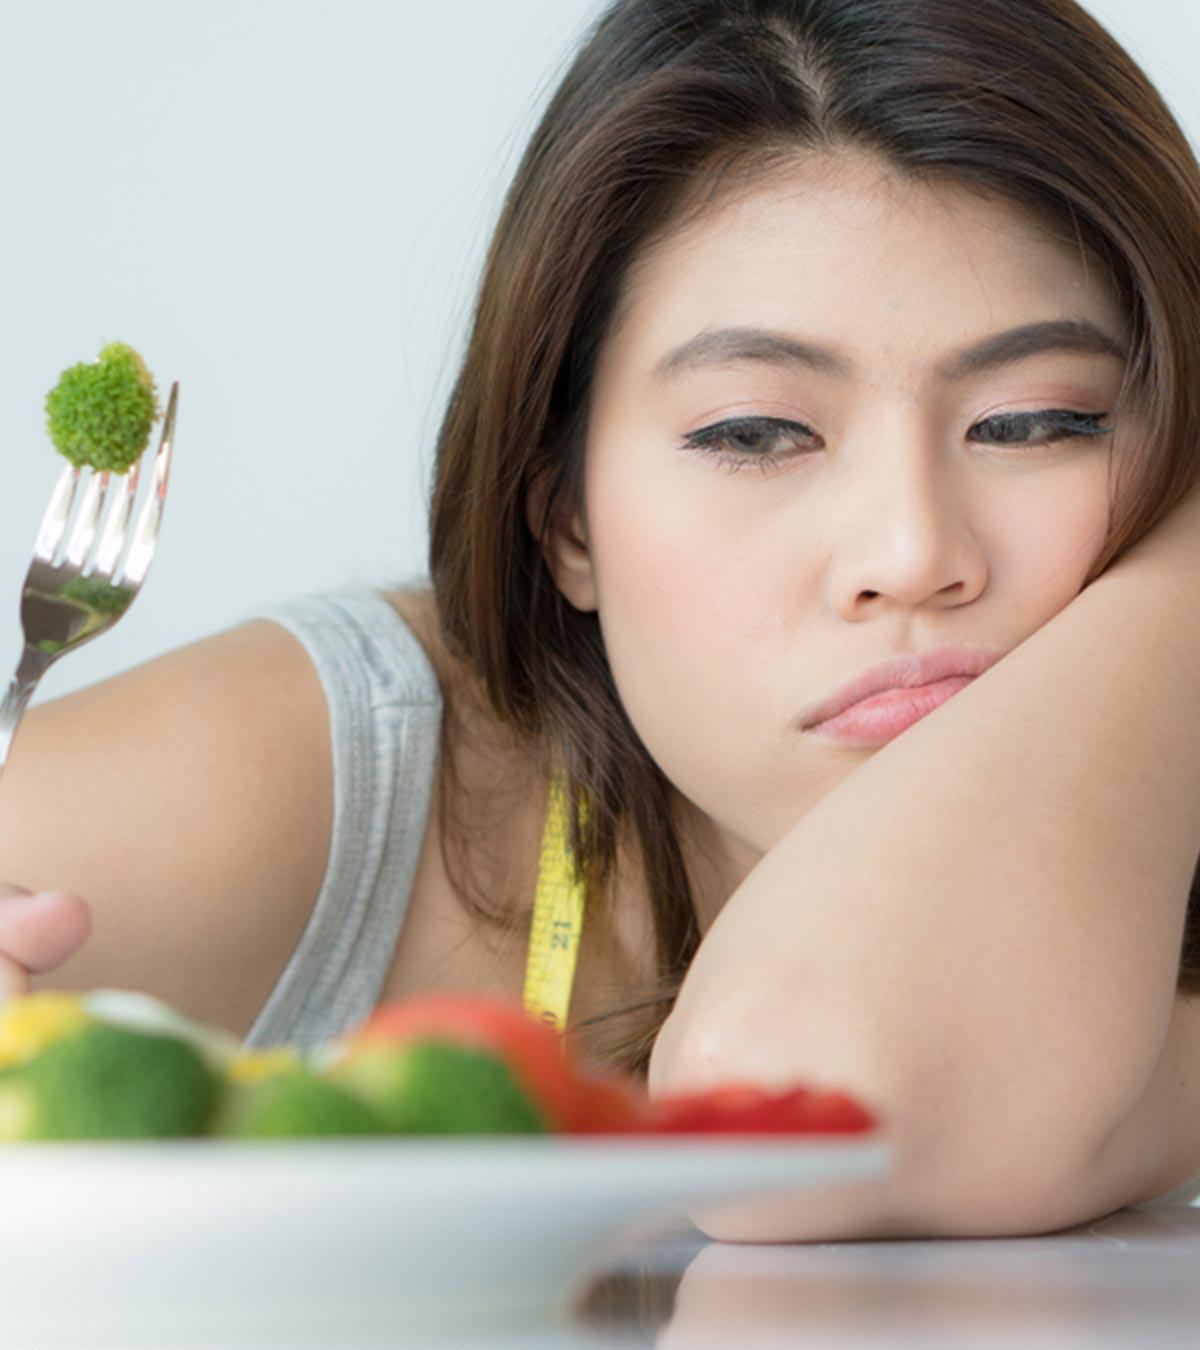 Prevent Anorexia and Bulimia